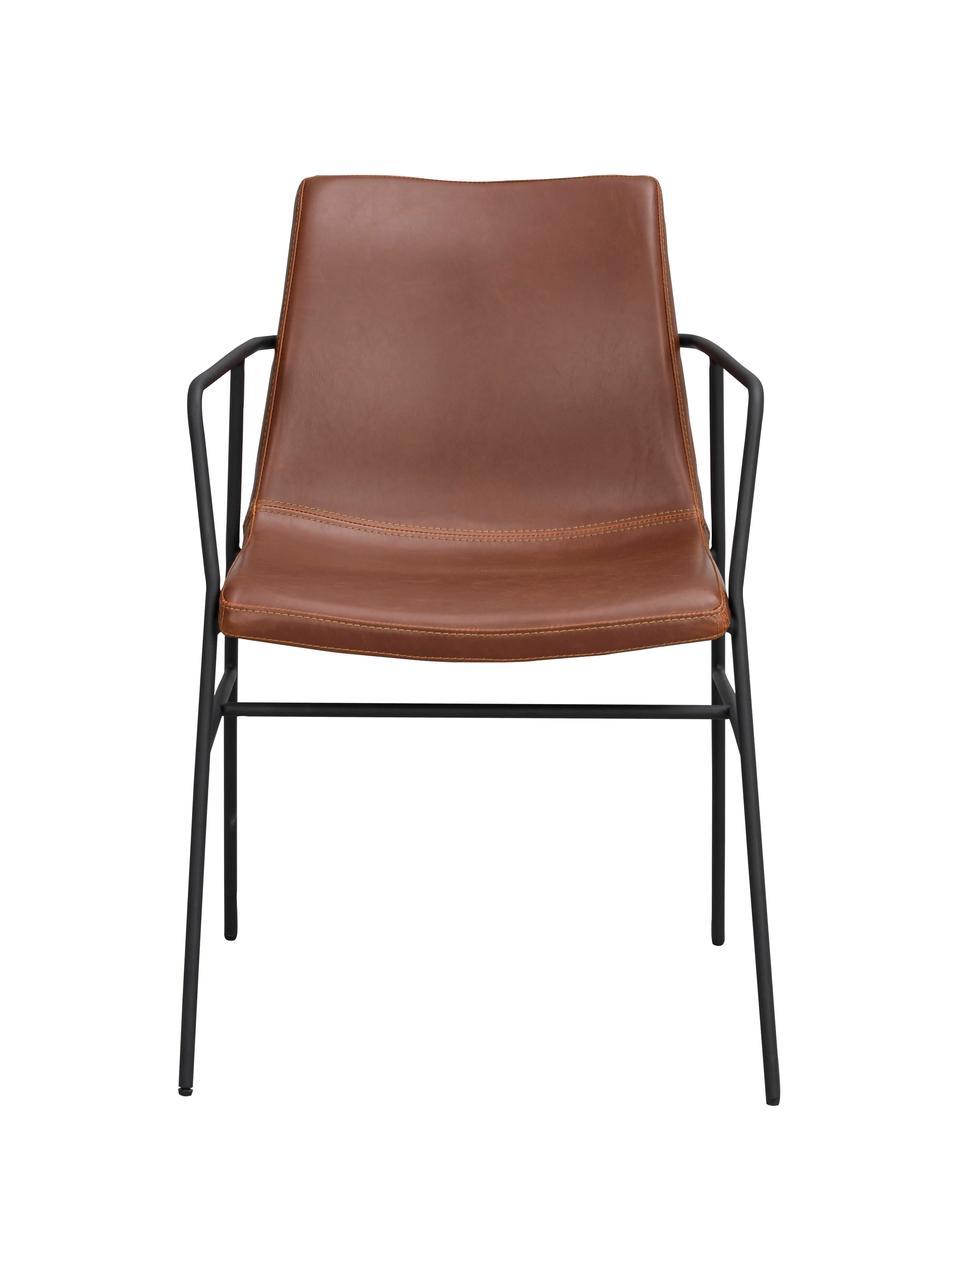 Sedia in similpelle marrone con braccioli Huntington 2 pz, Rivestimento: pelle ecologica (poliuret, Gambe: metallo rivestito, Similpelle marrone, Larg. 54 x Prof. 58 cm